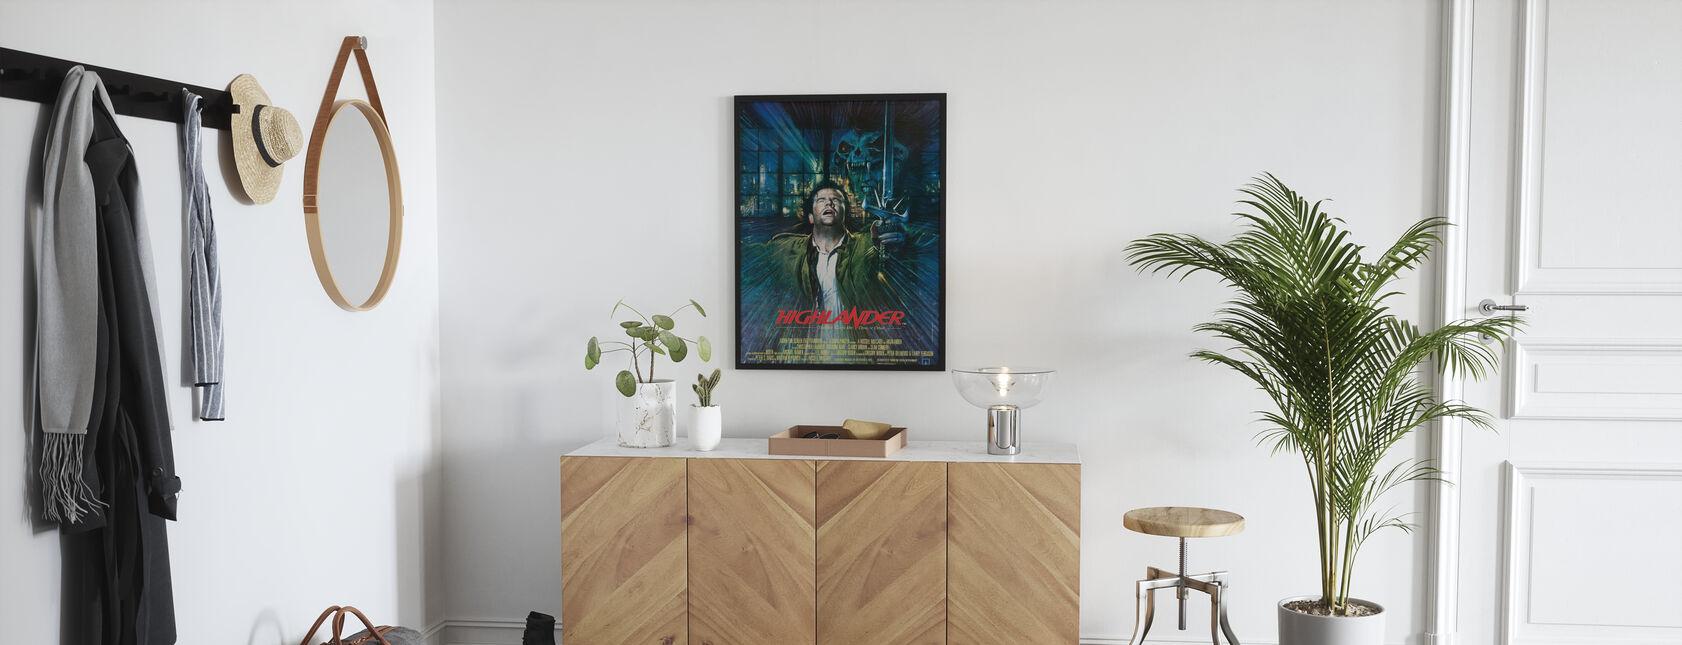 Highlander - Poster - Hallway